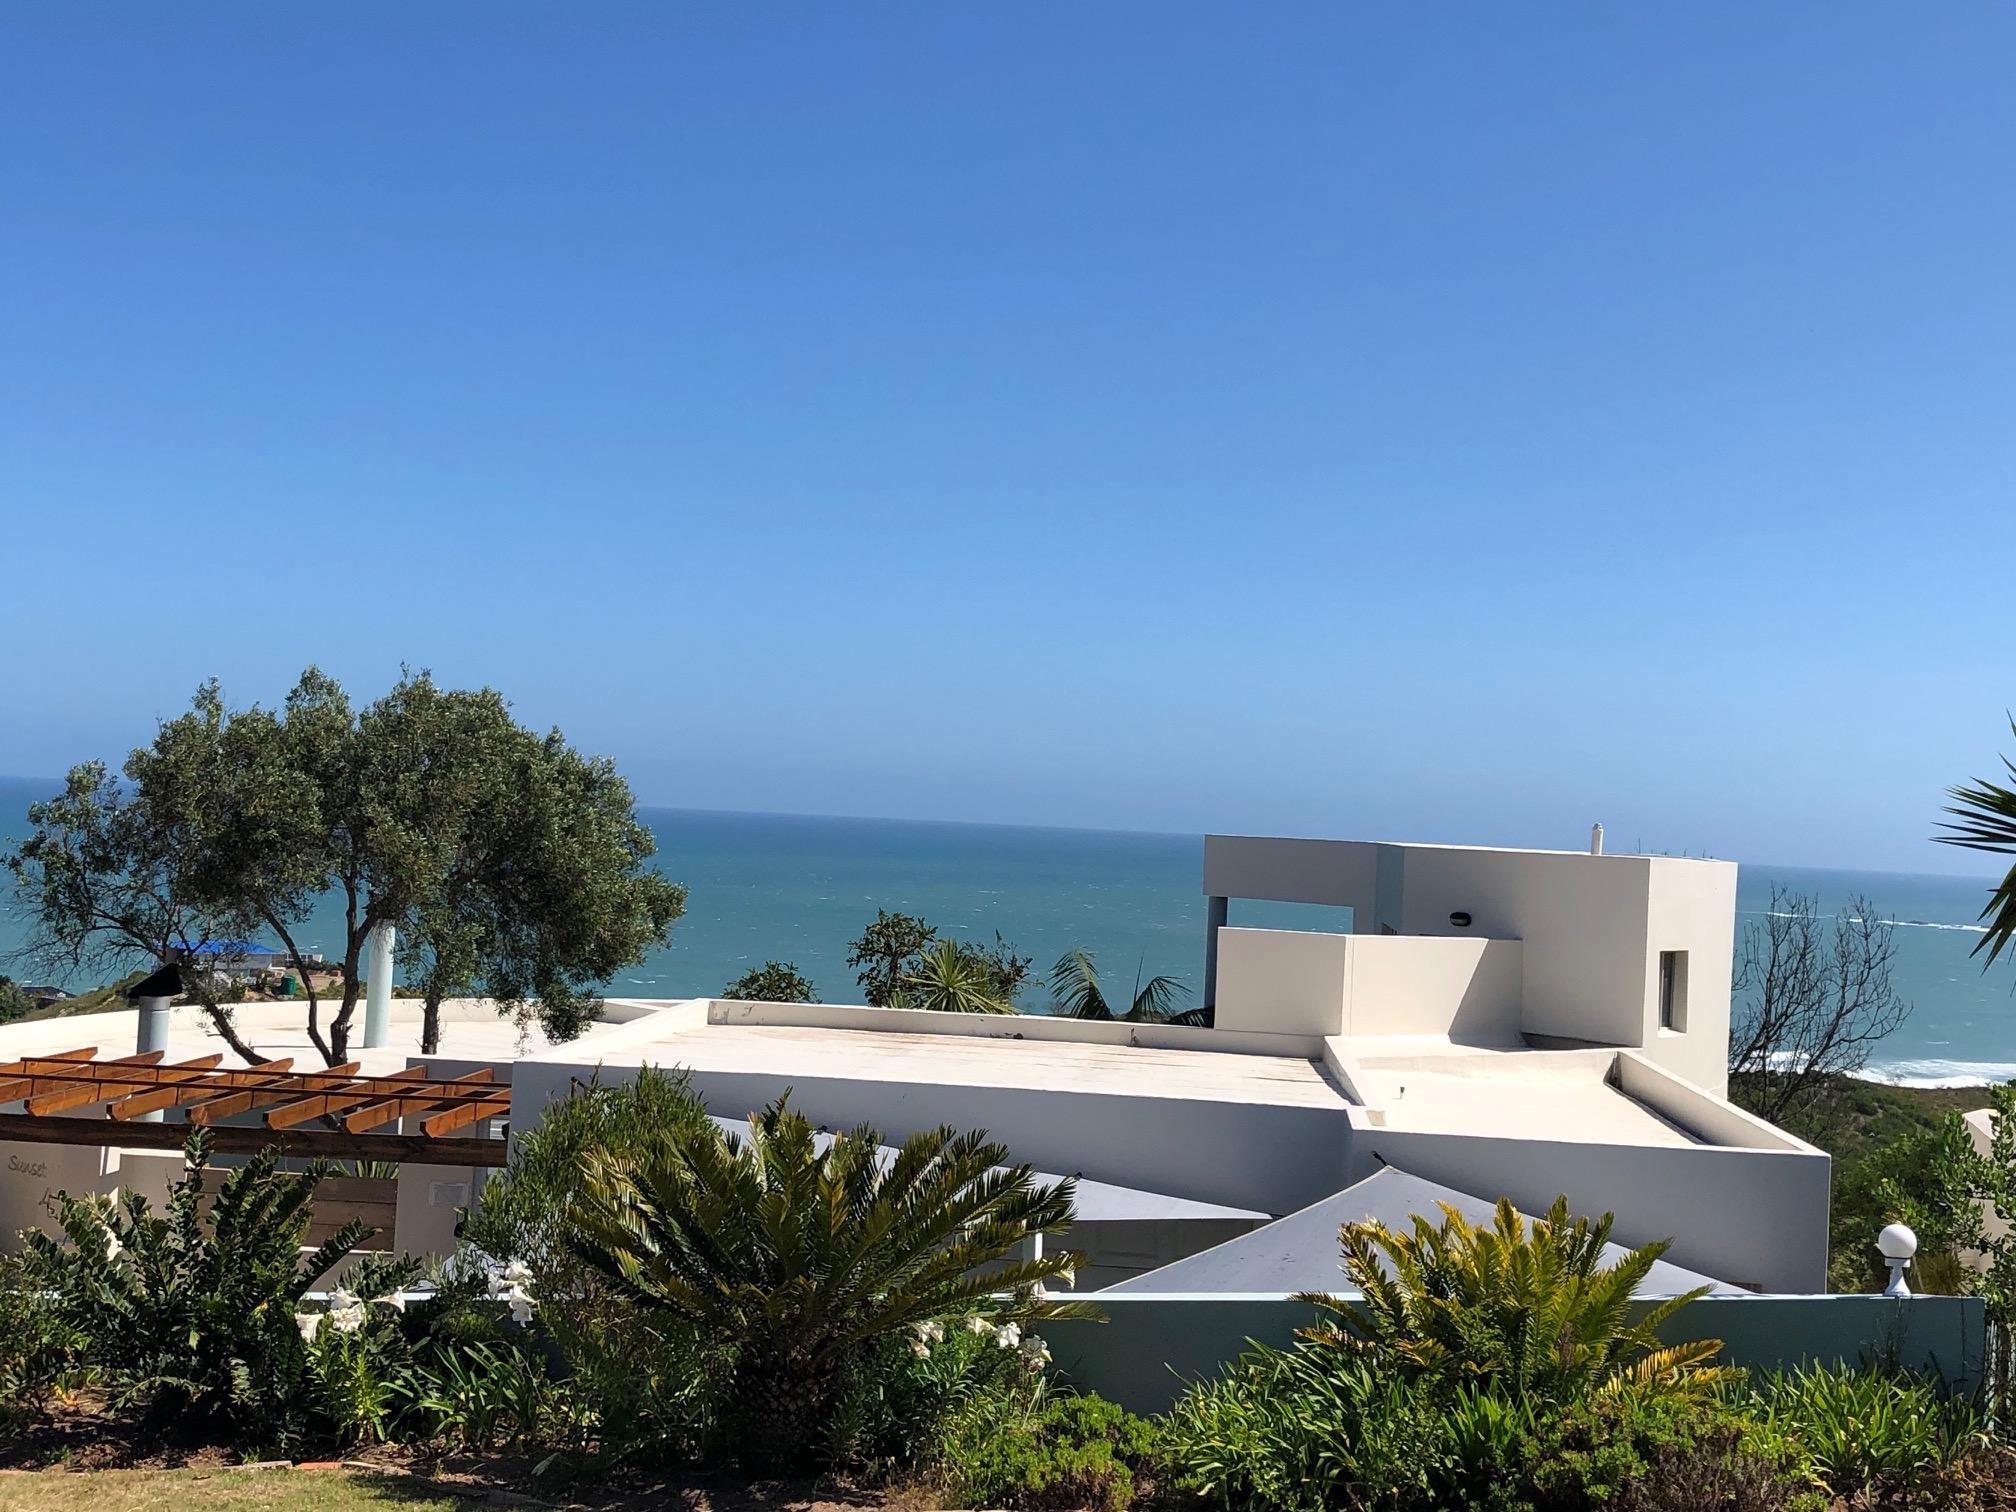 Holiday Rental in Brenton-on-sea